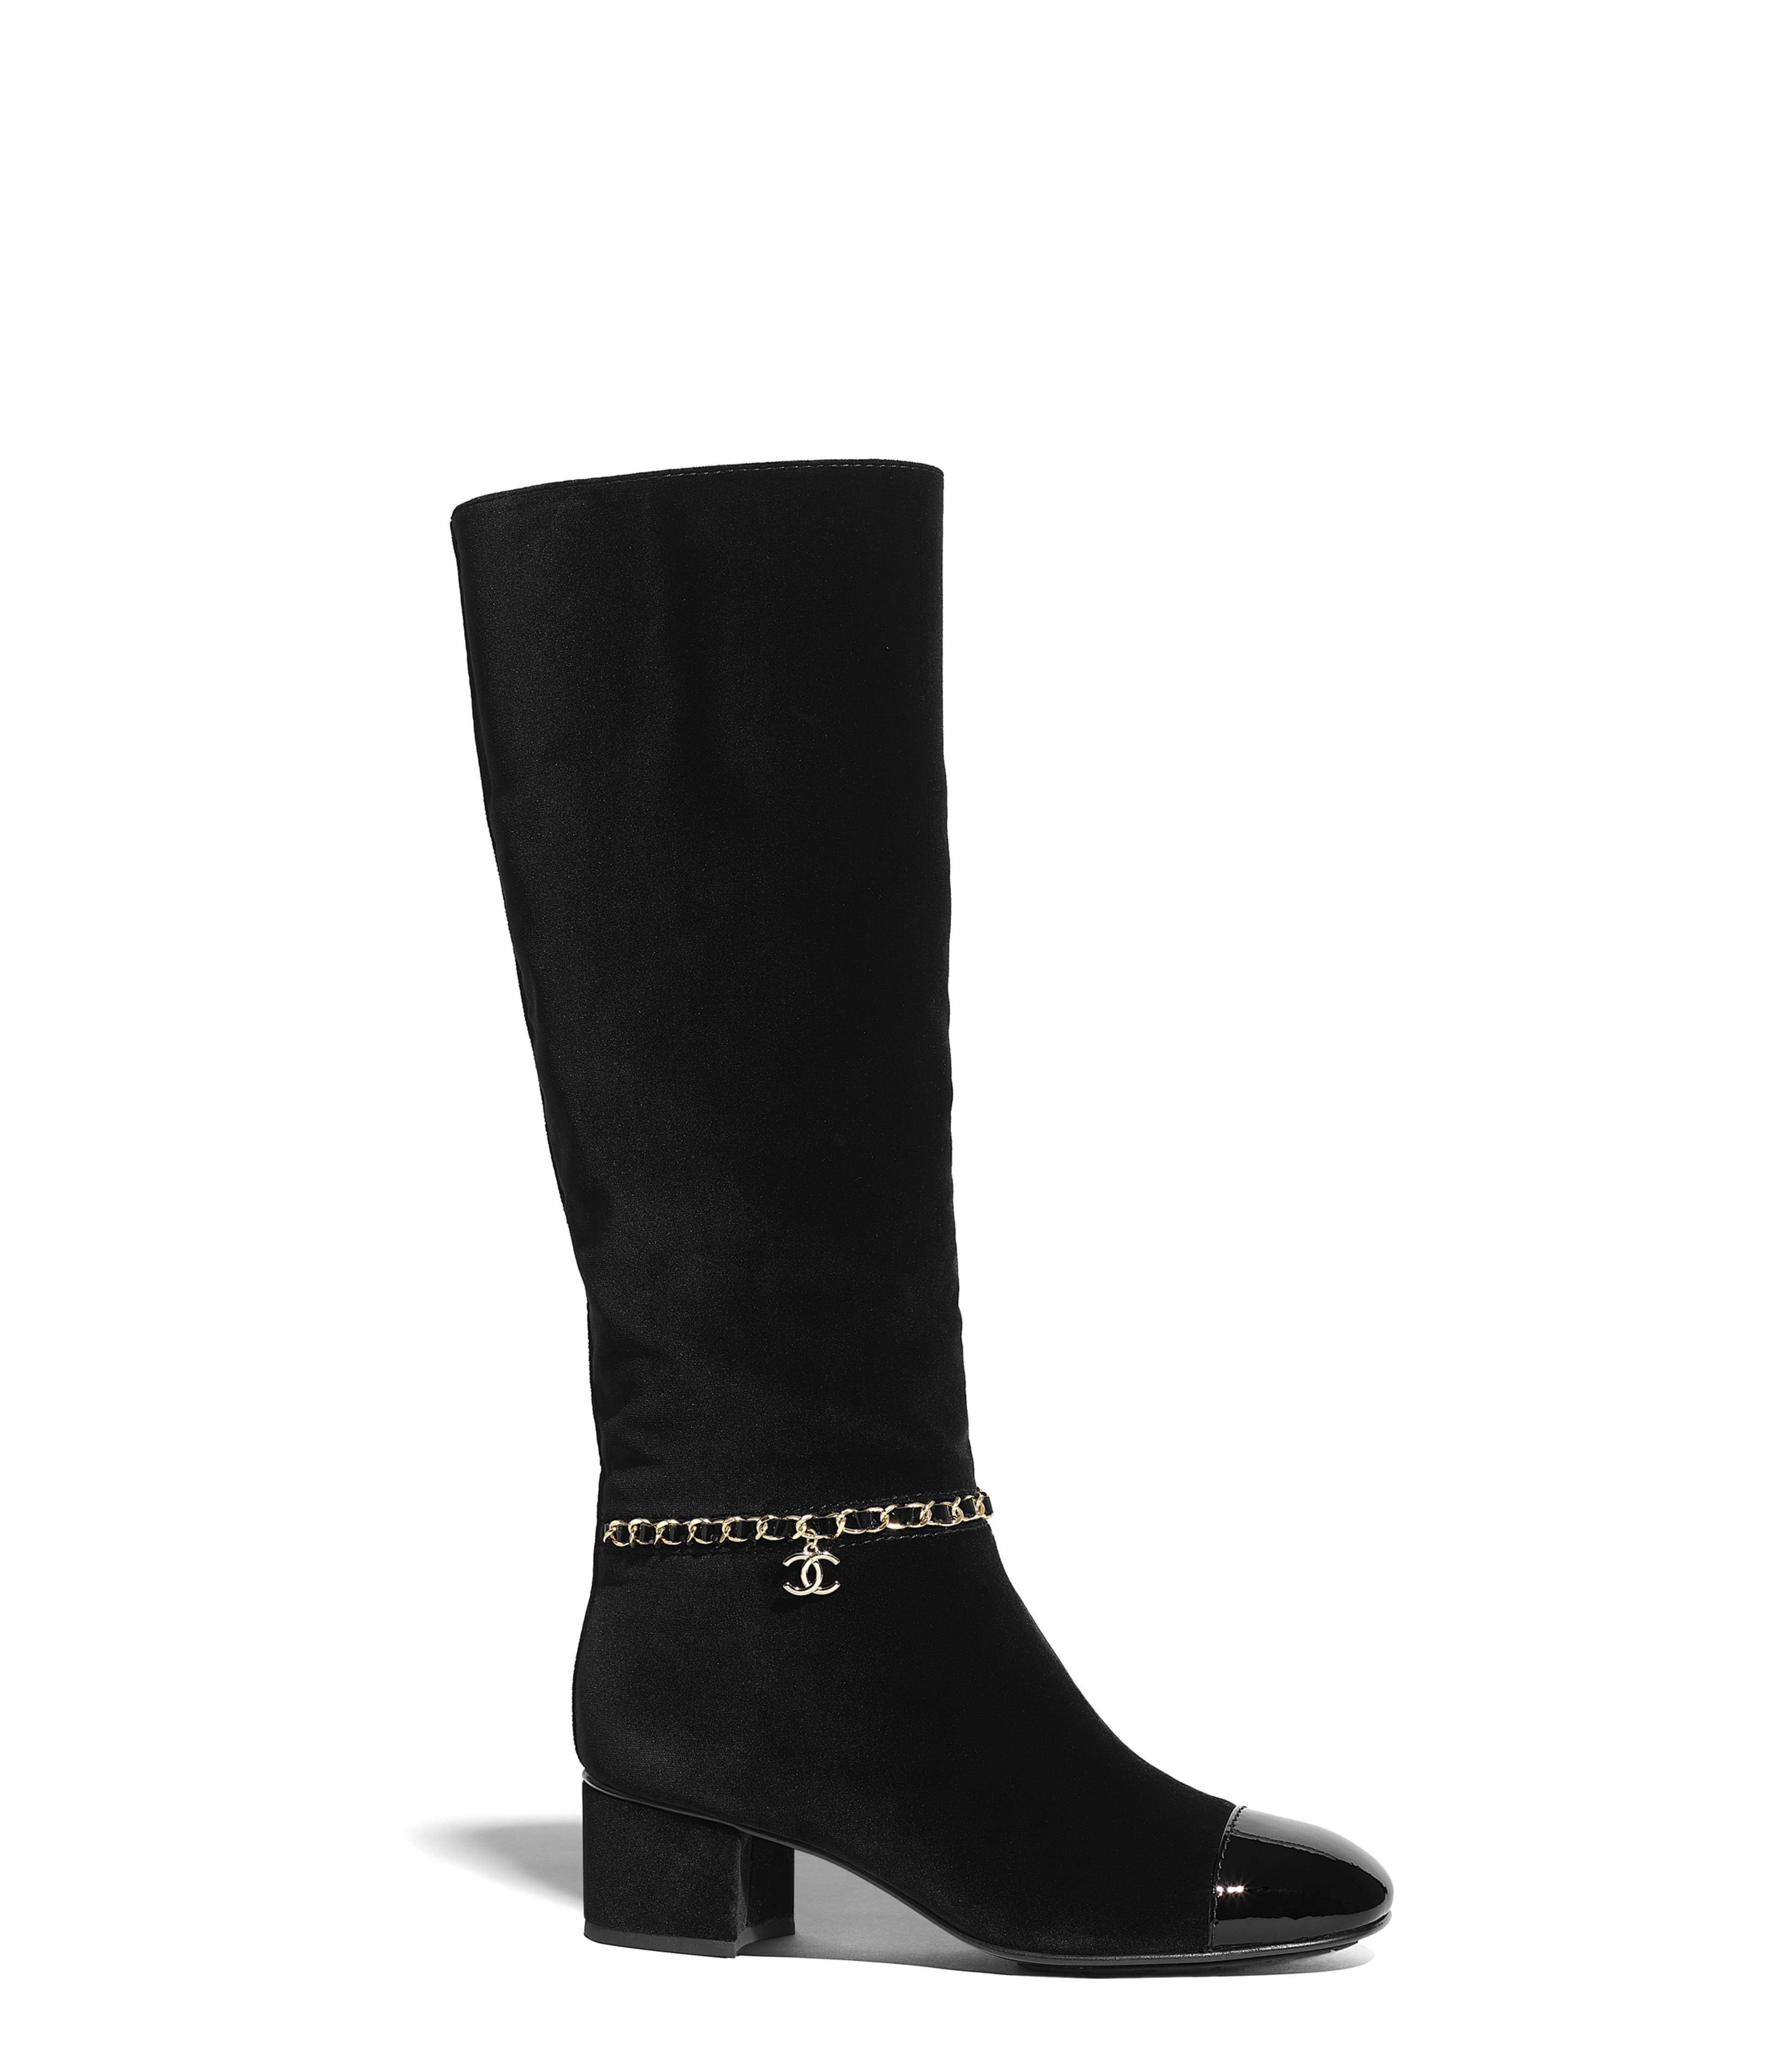 1ff731fd5 High Boots Velvet & Patent Calfskin, Black Ref. G35006Y5340394305